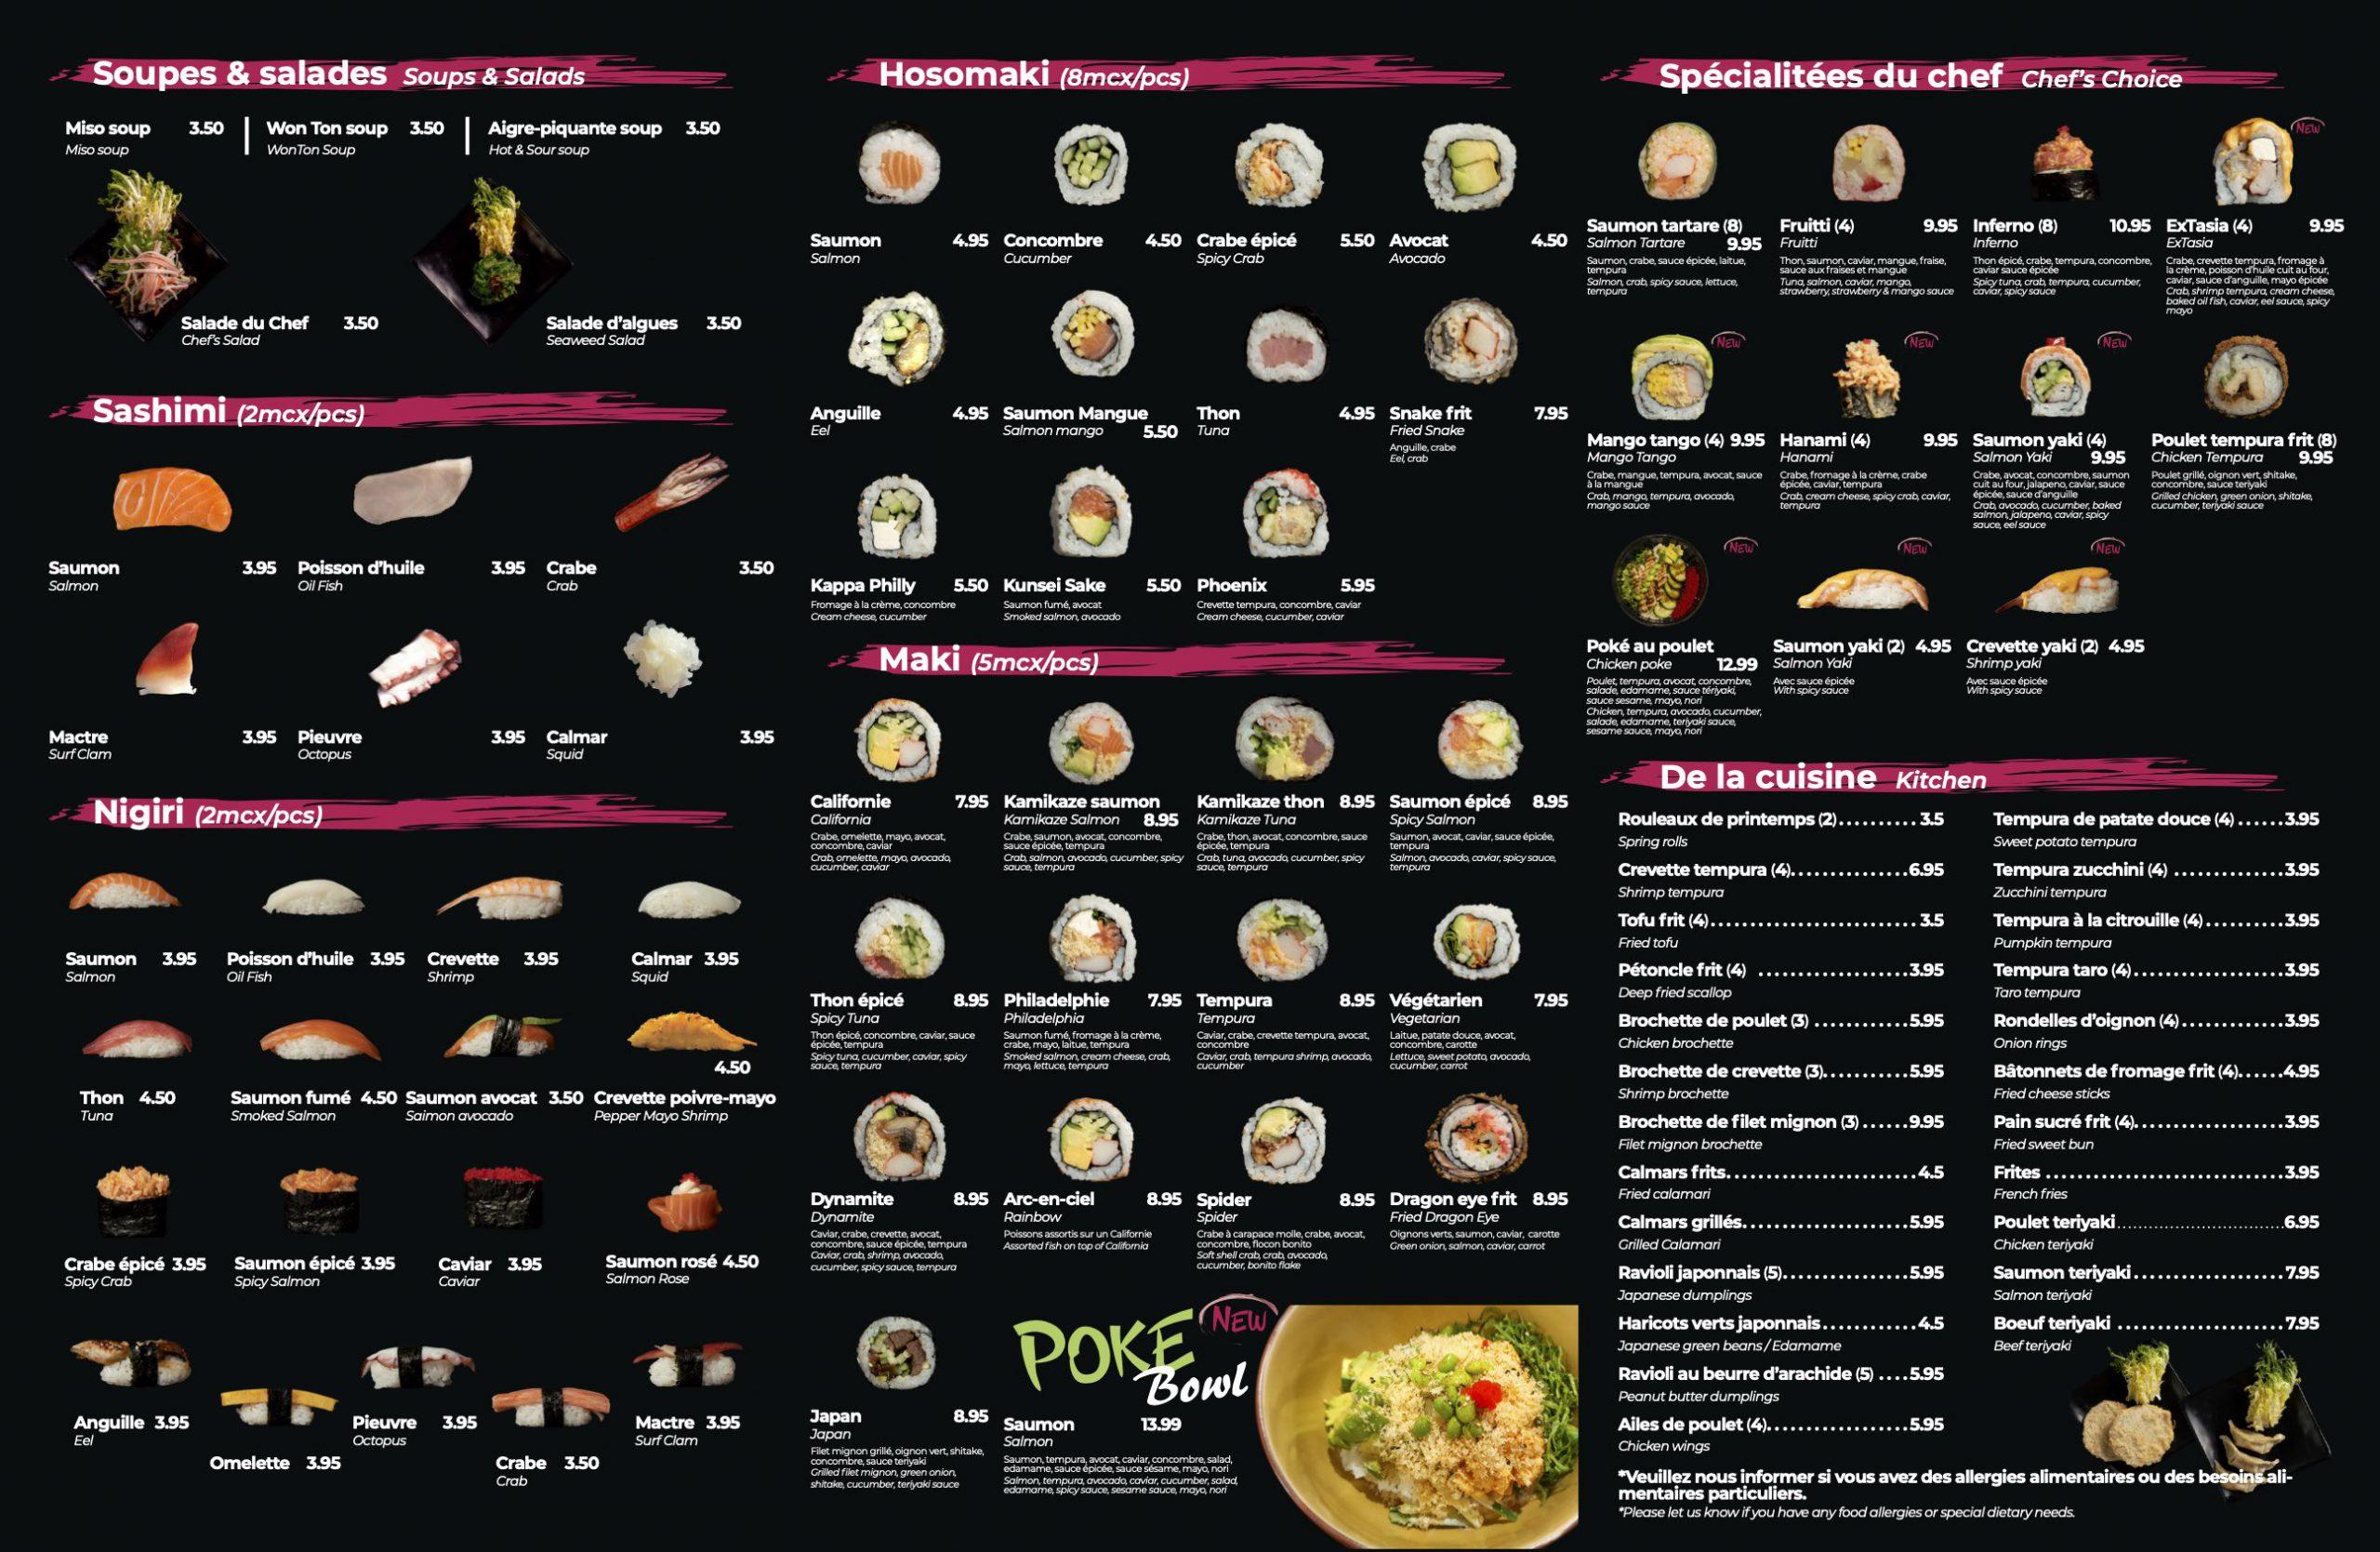 take-out-menu-v2_c-scaled.jpg